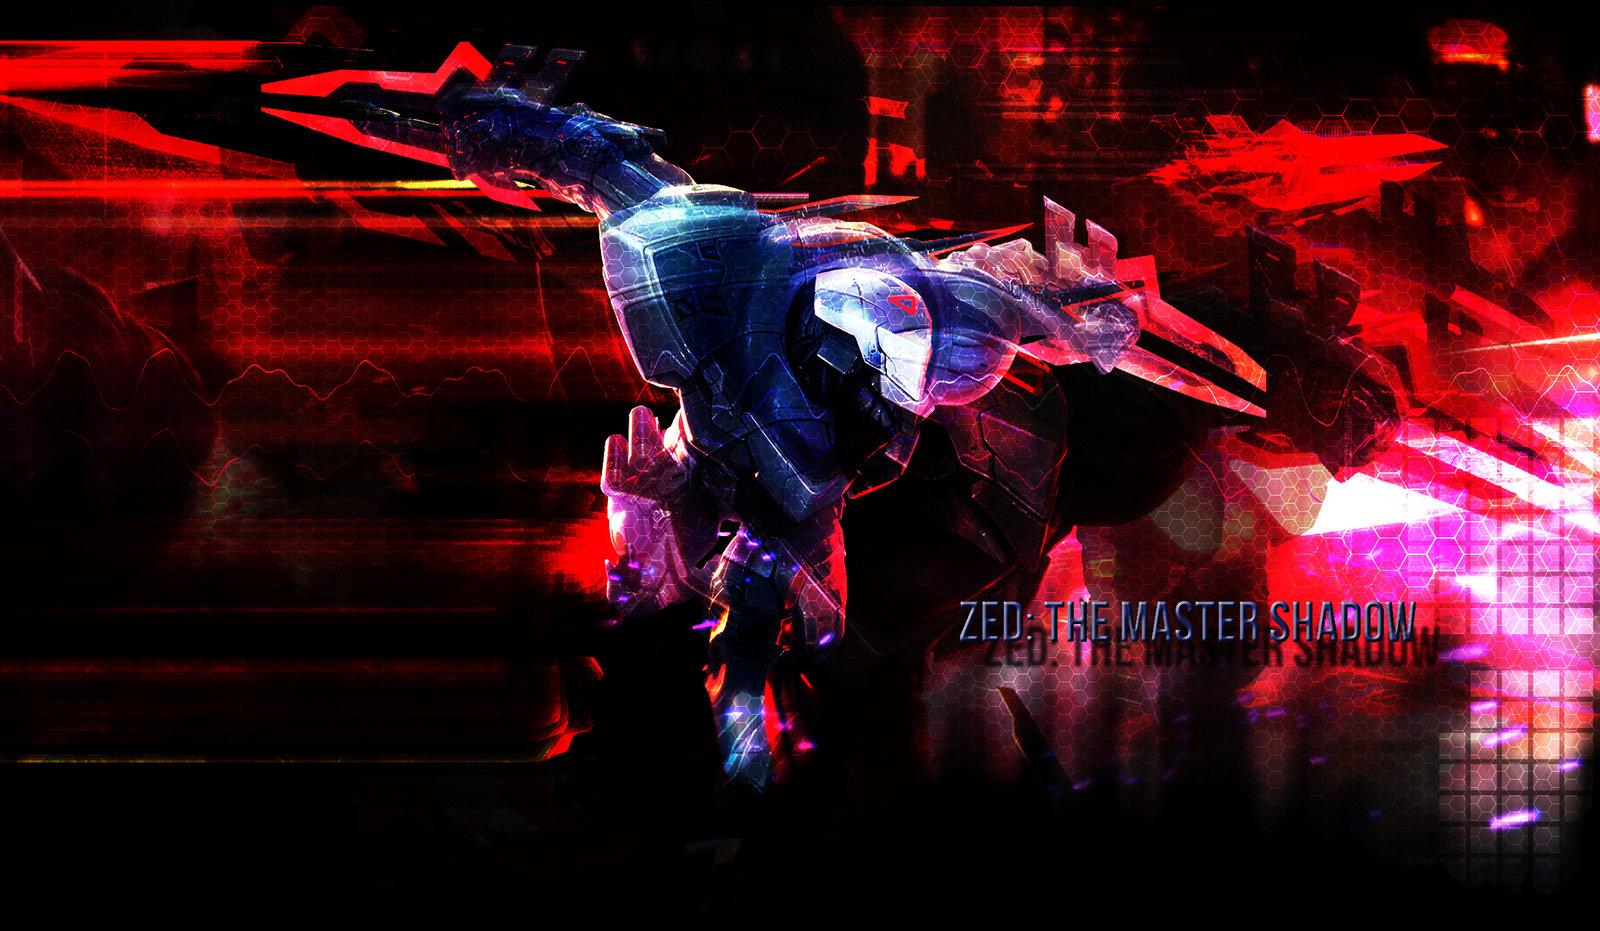 Project Zed Wallpaper - WallpaperSafari  Project Zed Wal...